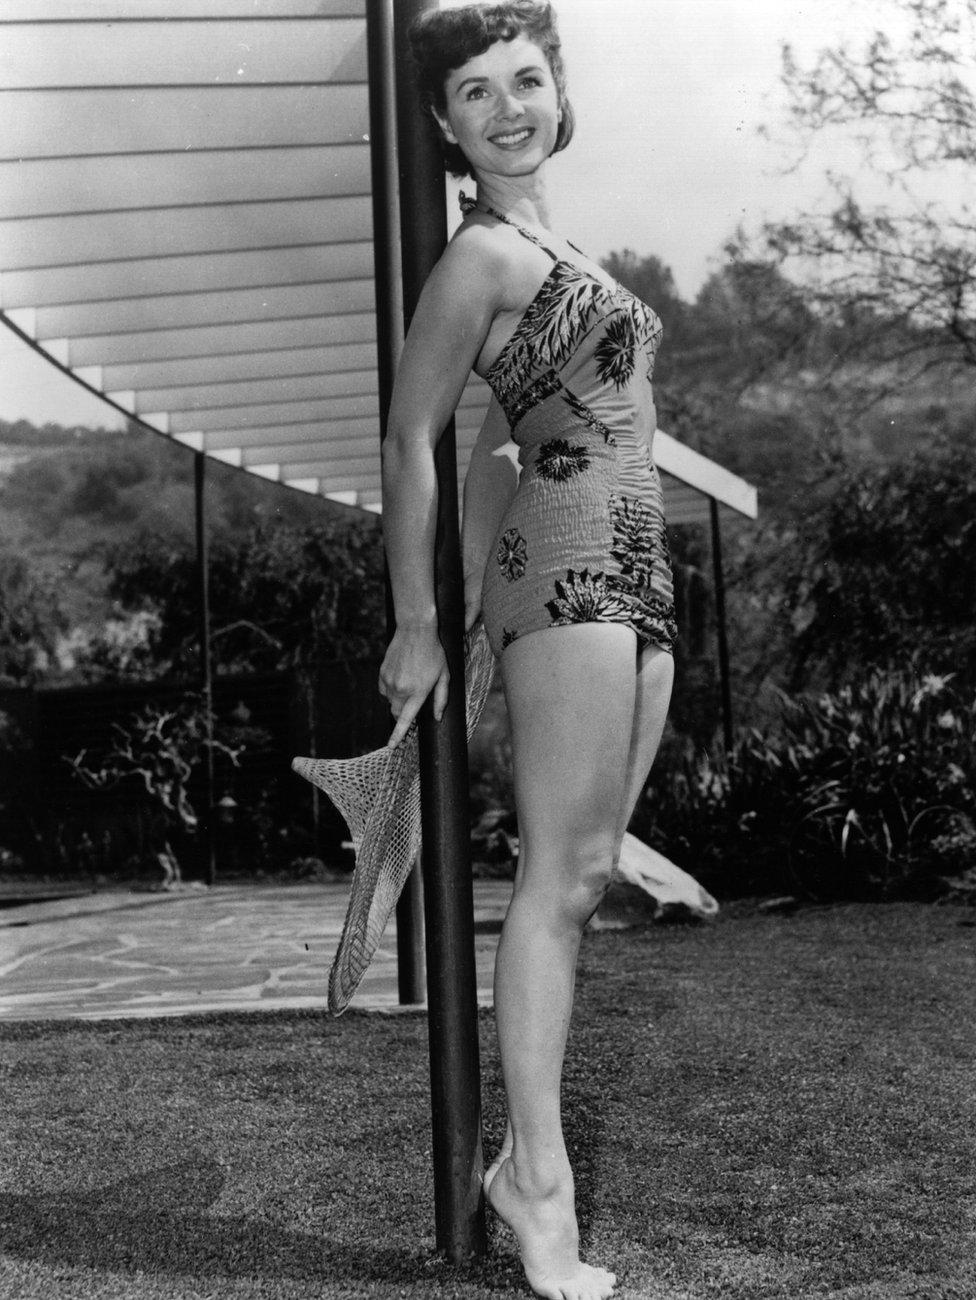 American actress, Debbie Reynolds modelling a swimsuit in the garden. Original Publication: